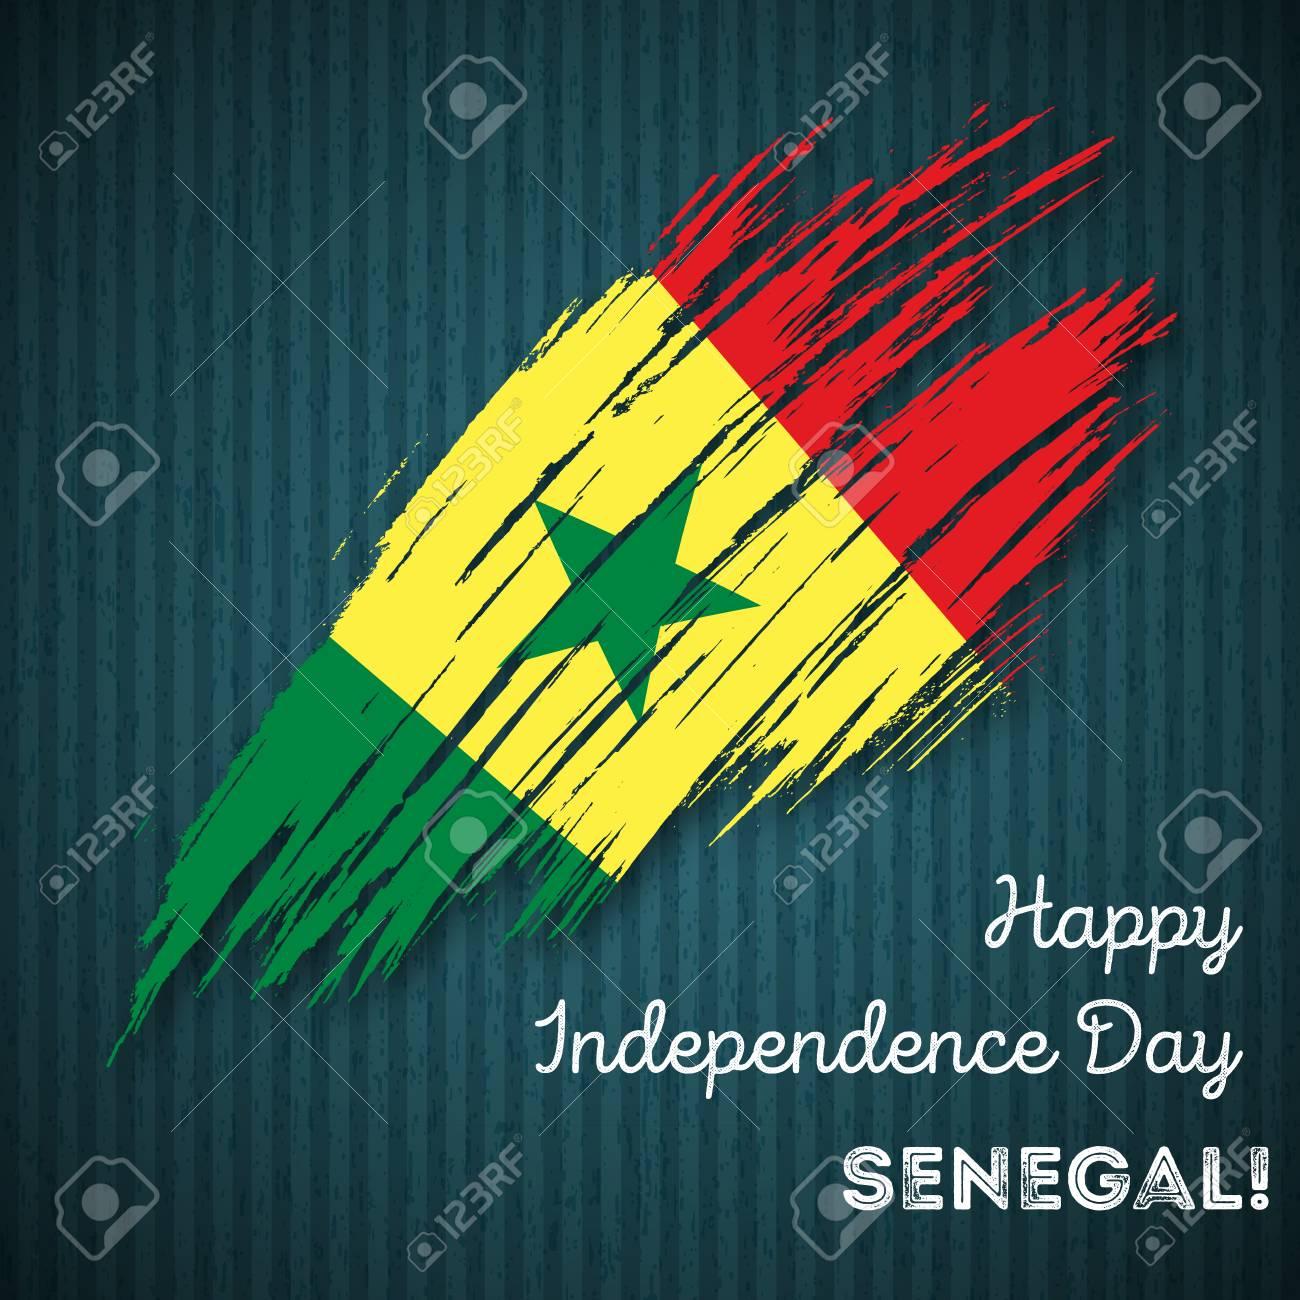 Senegal independence day patriotic design expressive brush stroke senegal independence day patriotic design expressive brush stroke in national flag colors on dark striped m4hsunfo